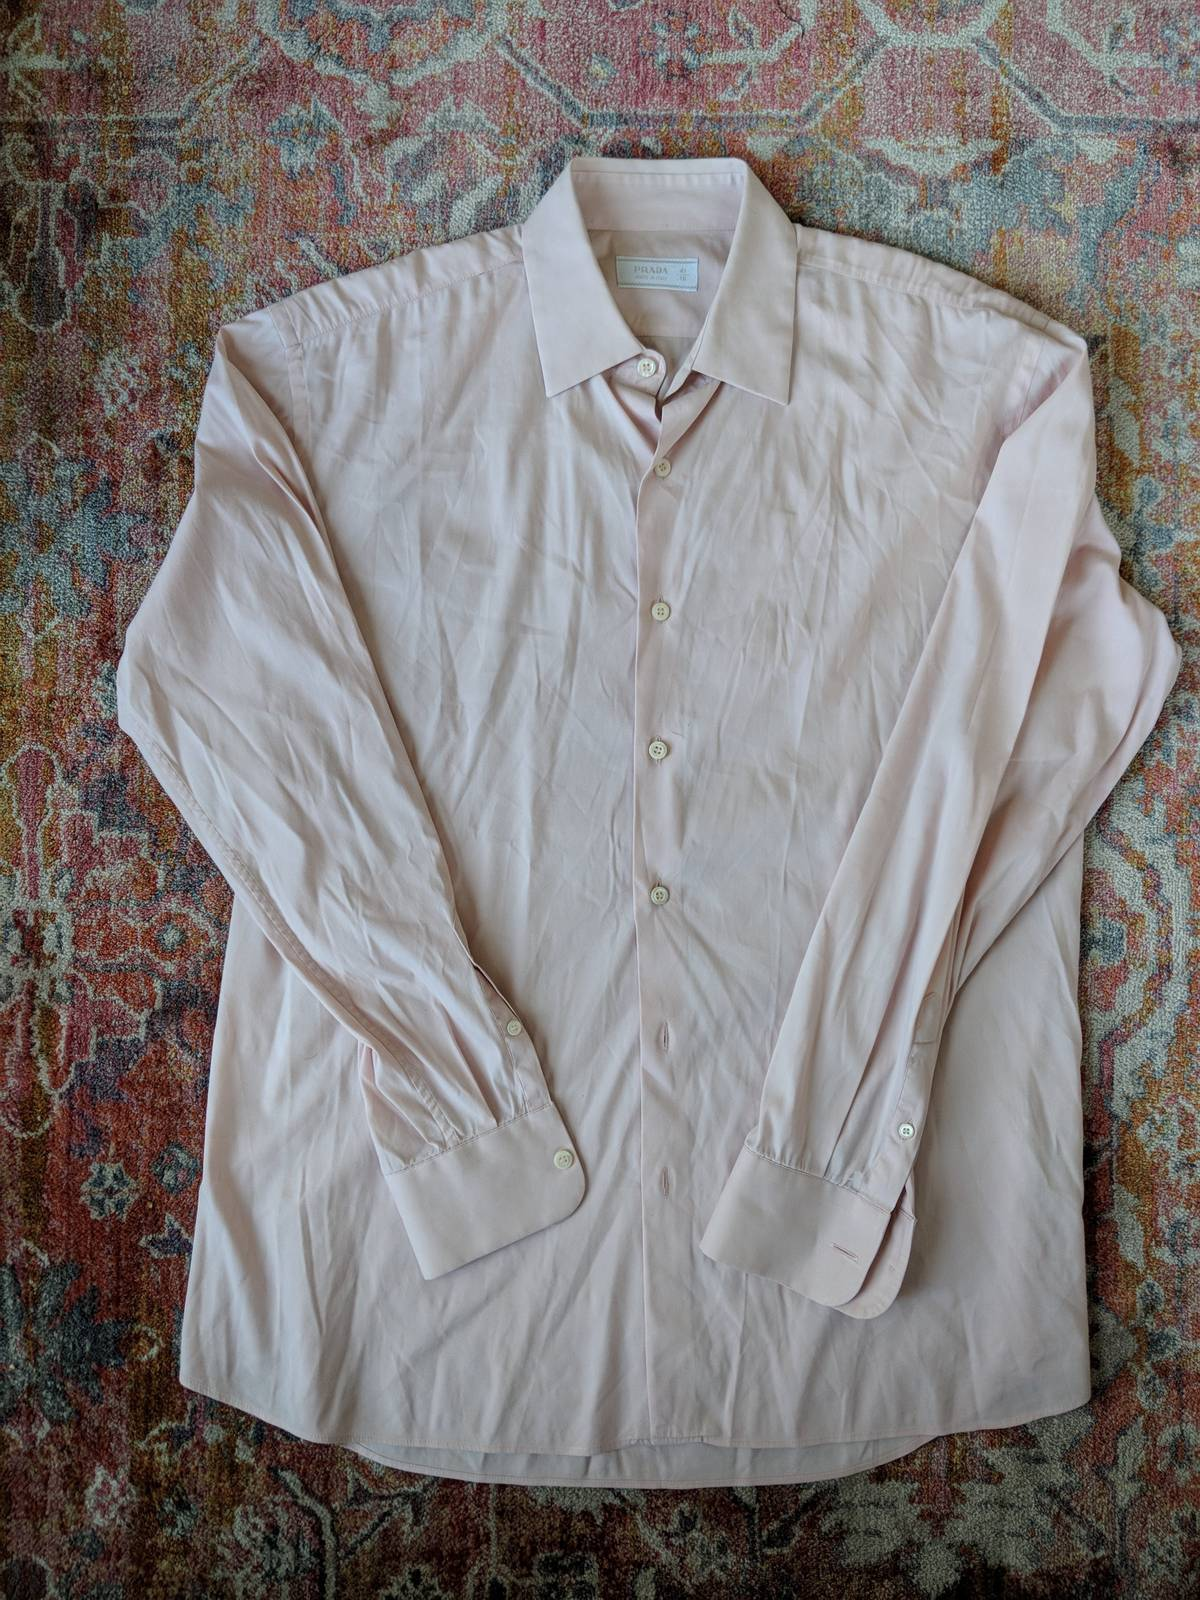 Prada Prada Italy Pink Blush Salmon Dress Shirt Size 41 16 Size L